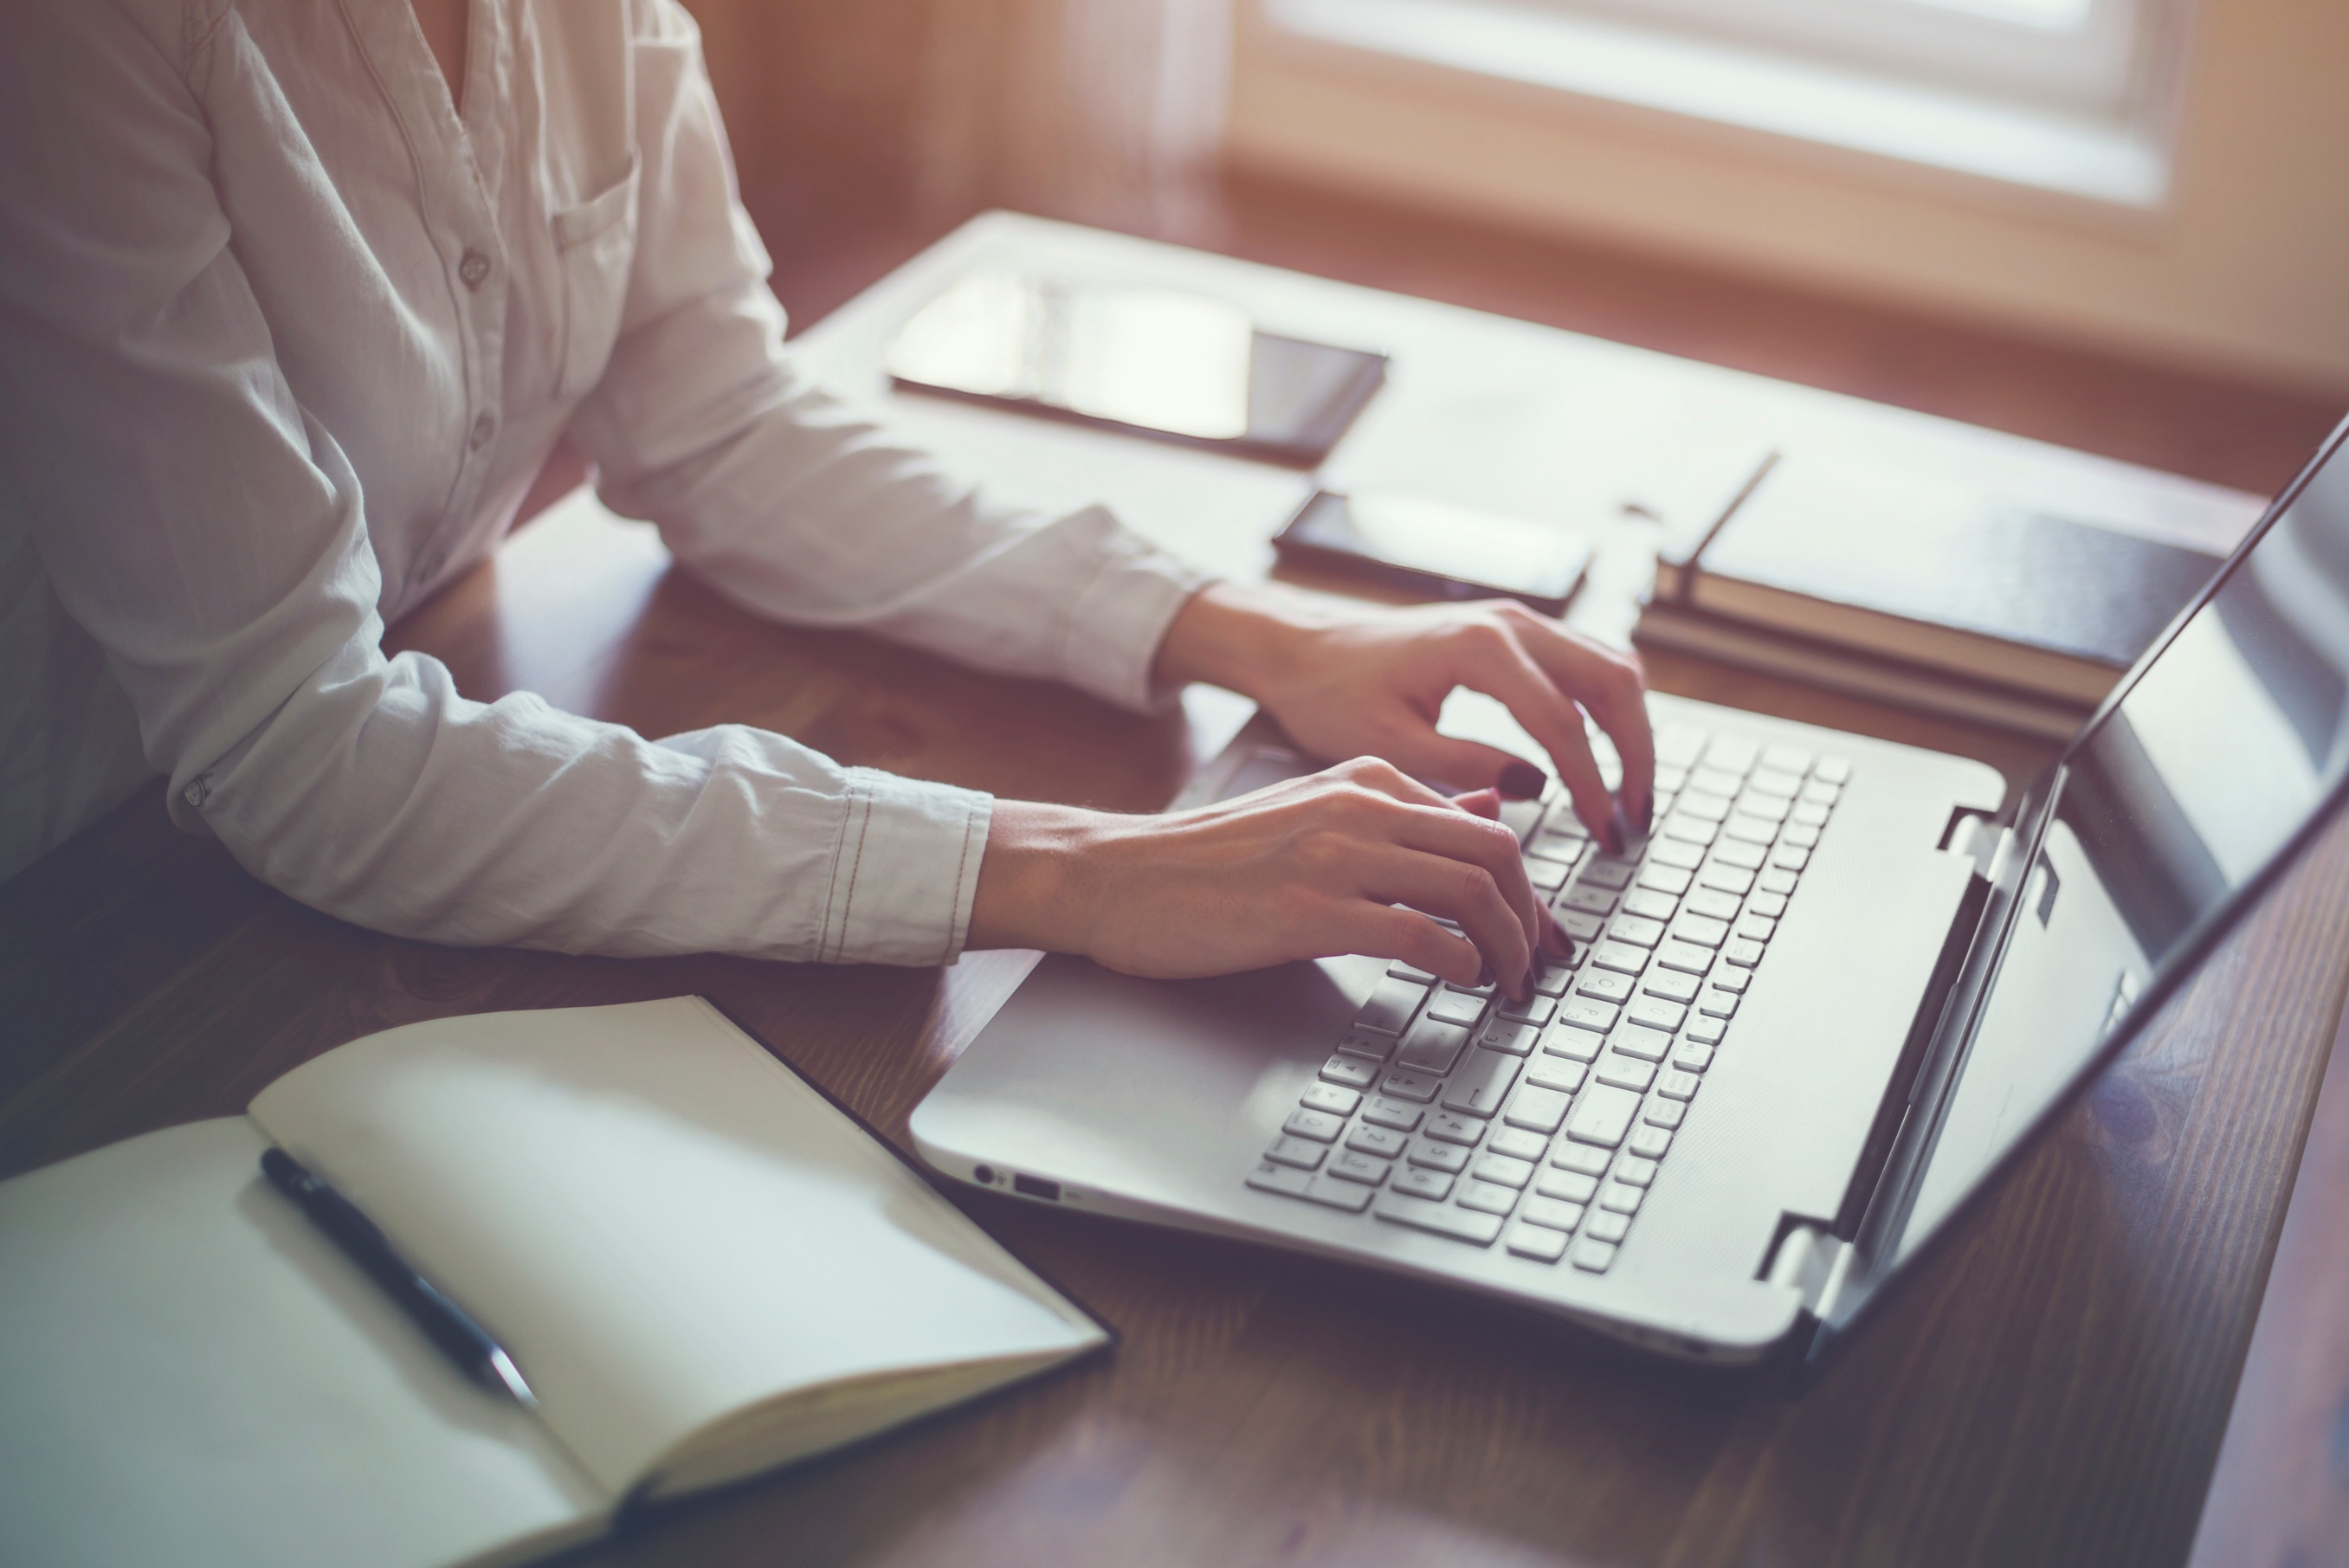 woman laptop work online.jpg